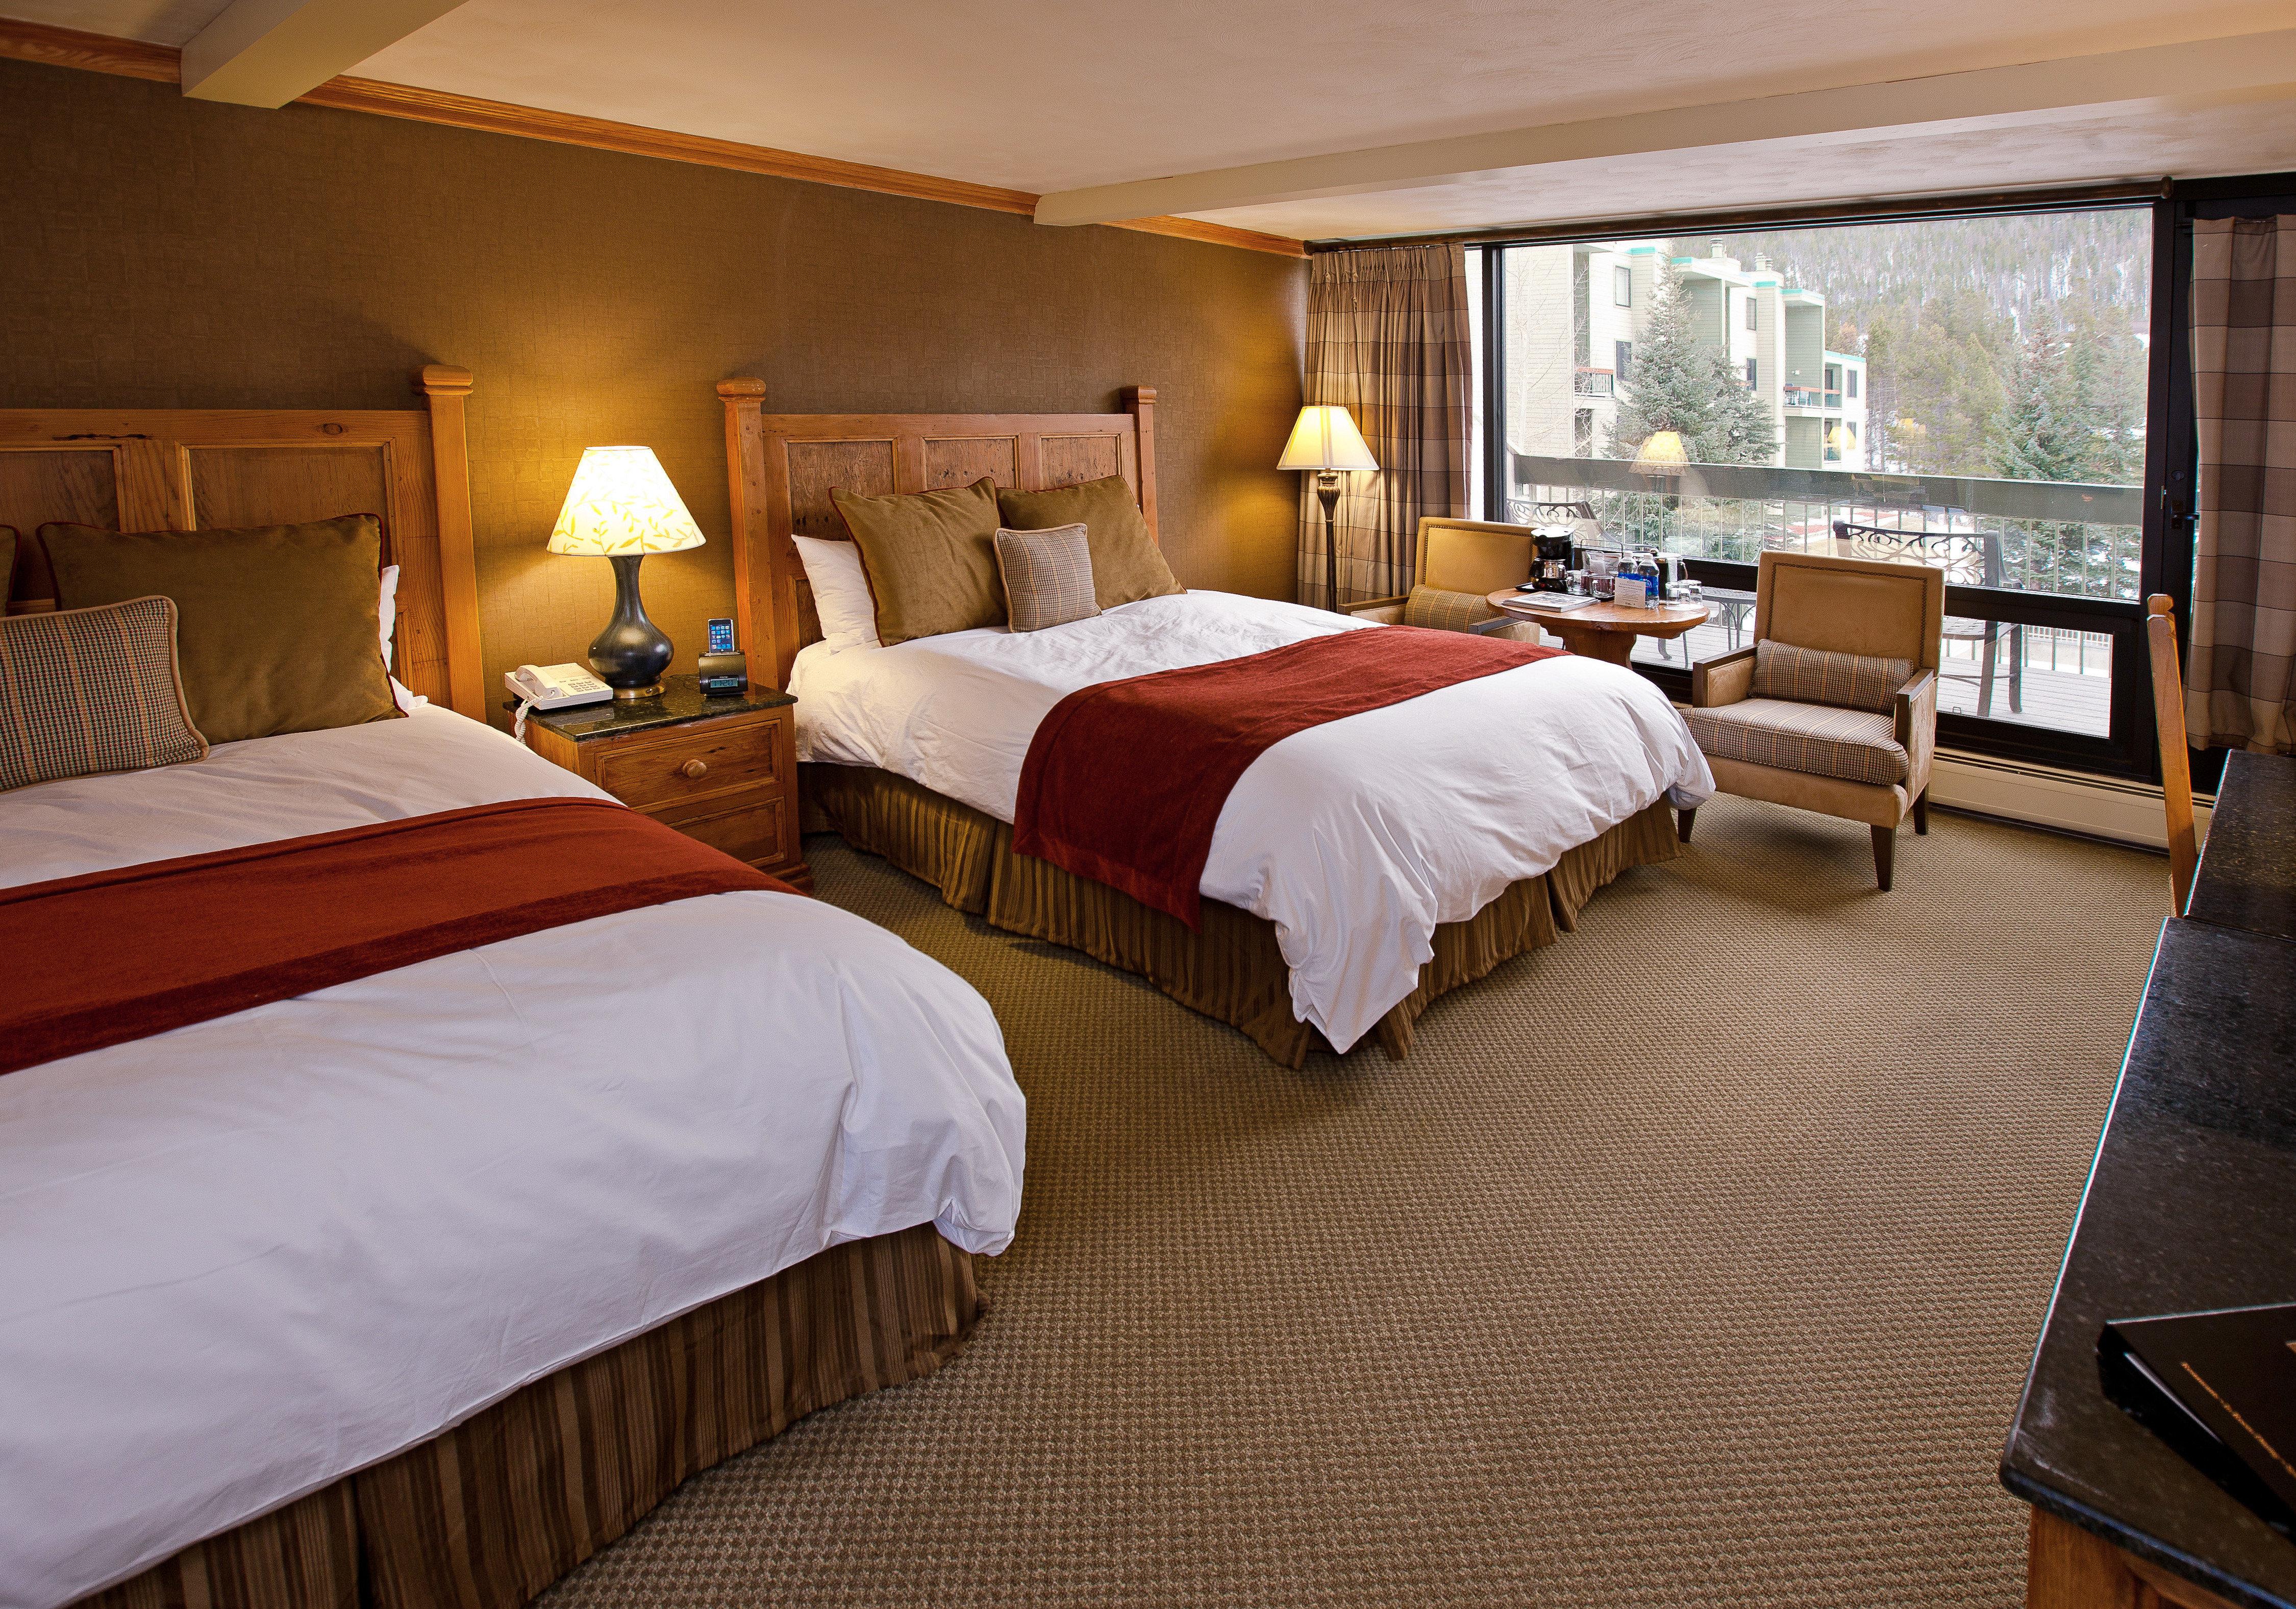 Bedroom Lodge Rustic property Suite cottage Resort night